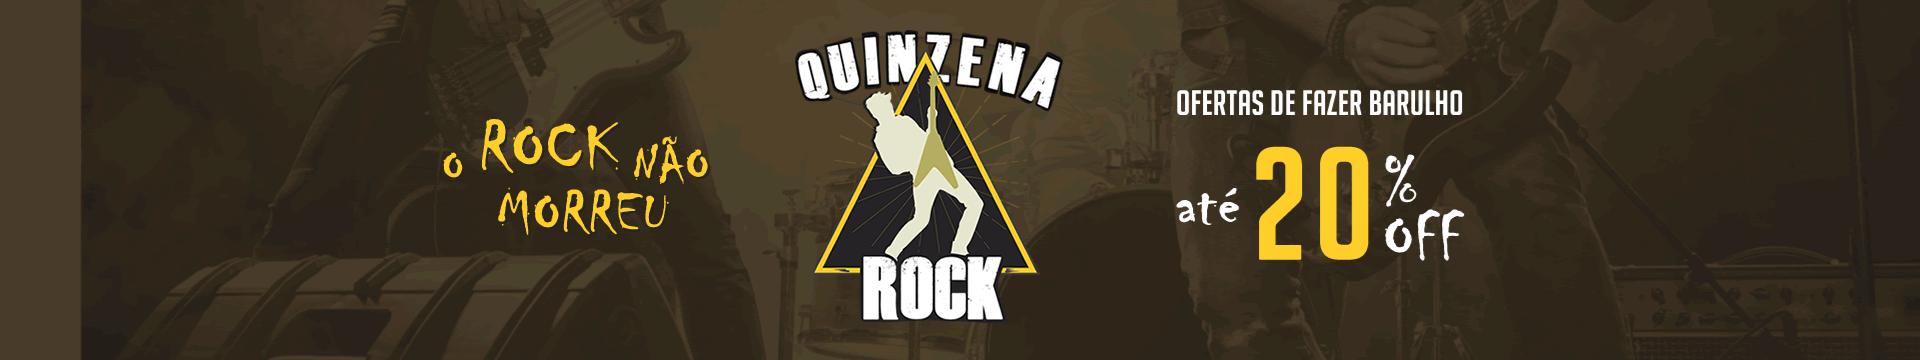 Quinzena do Rock